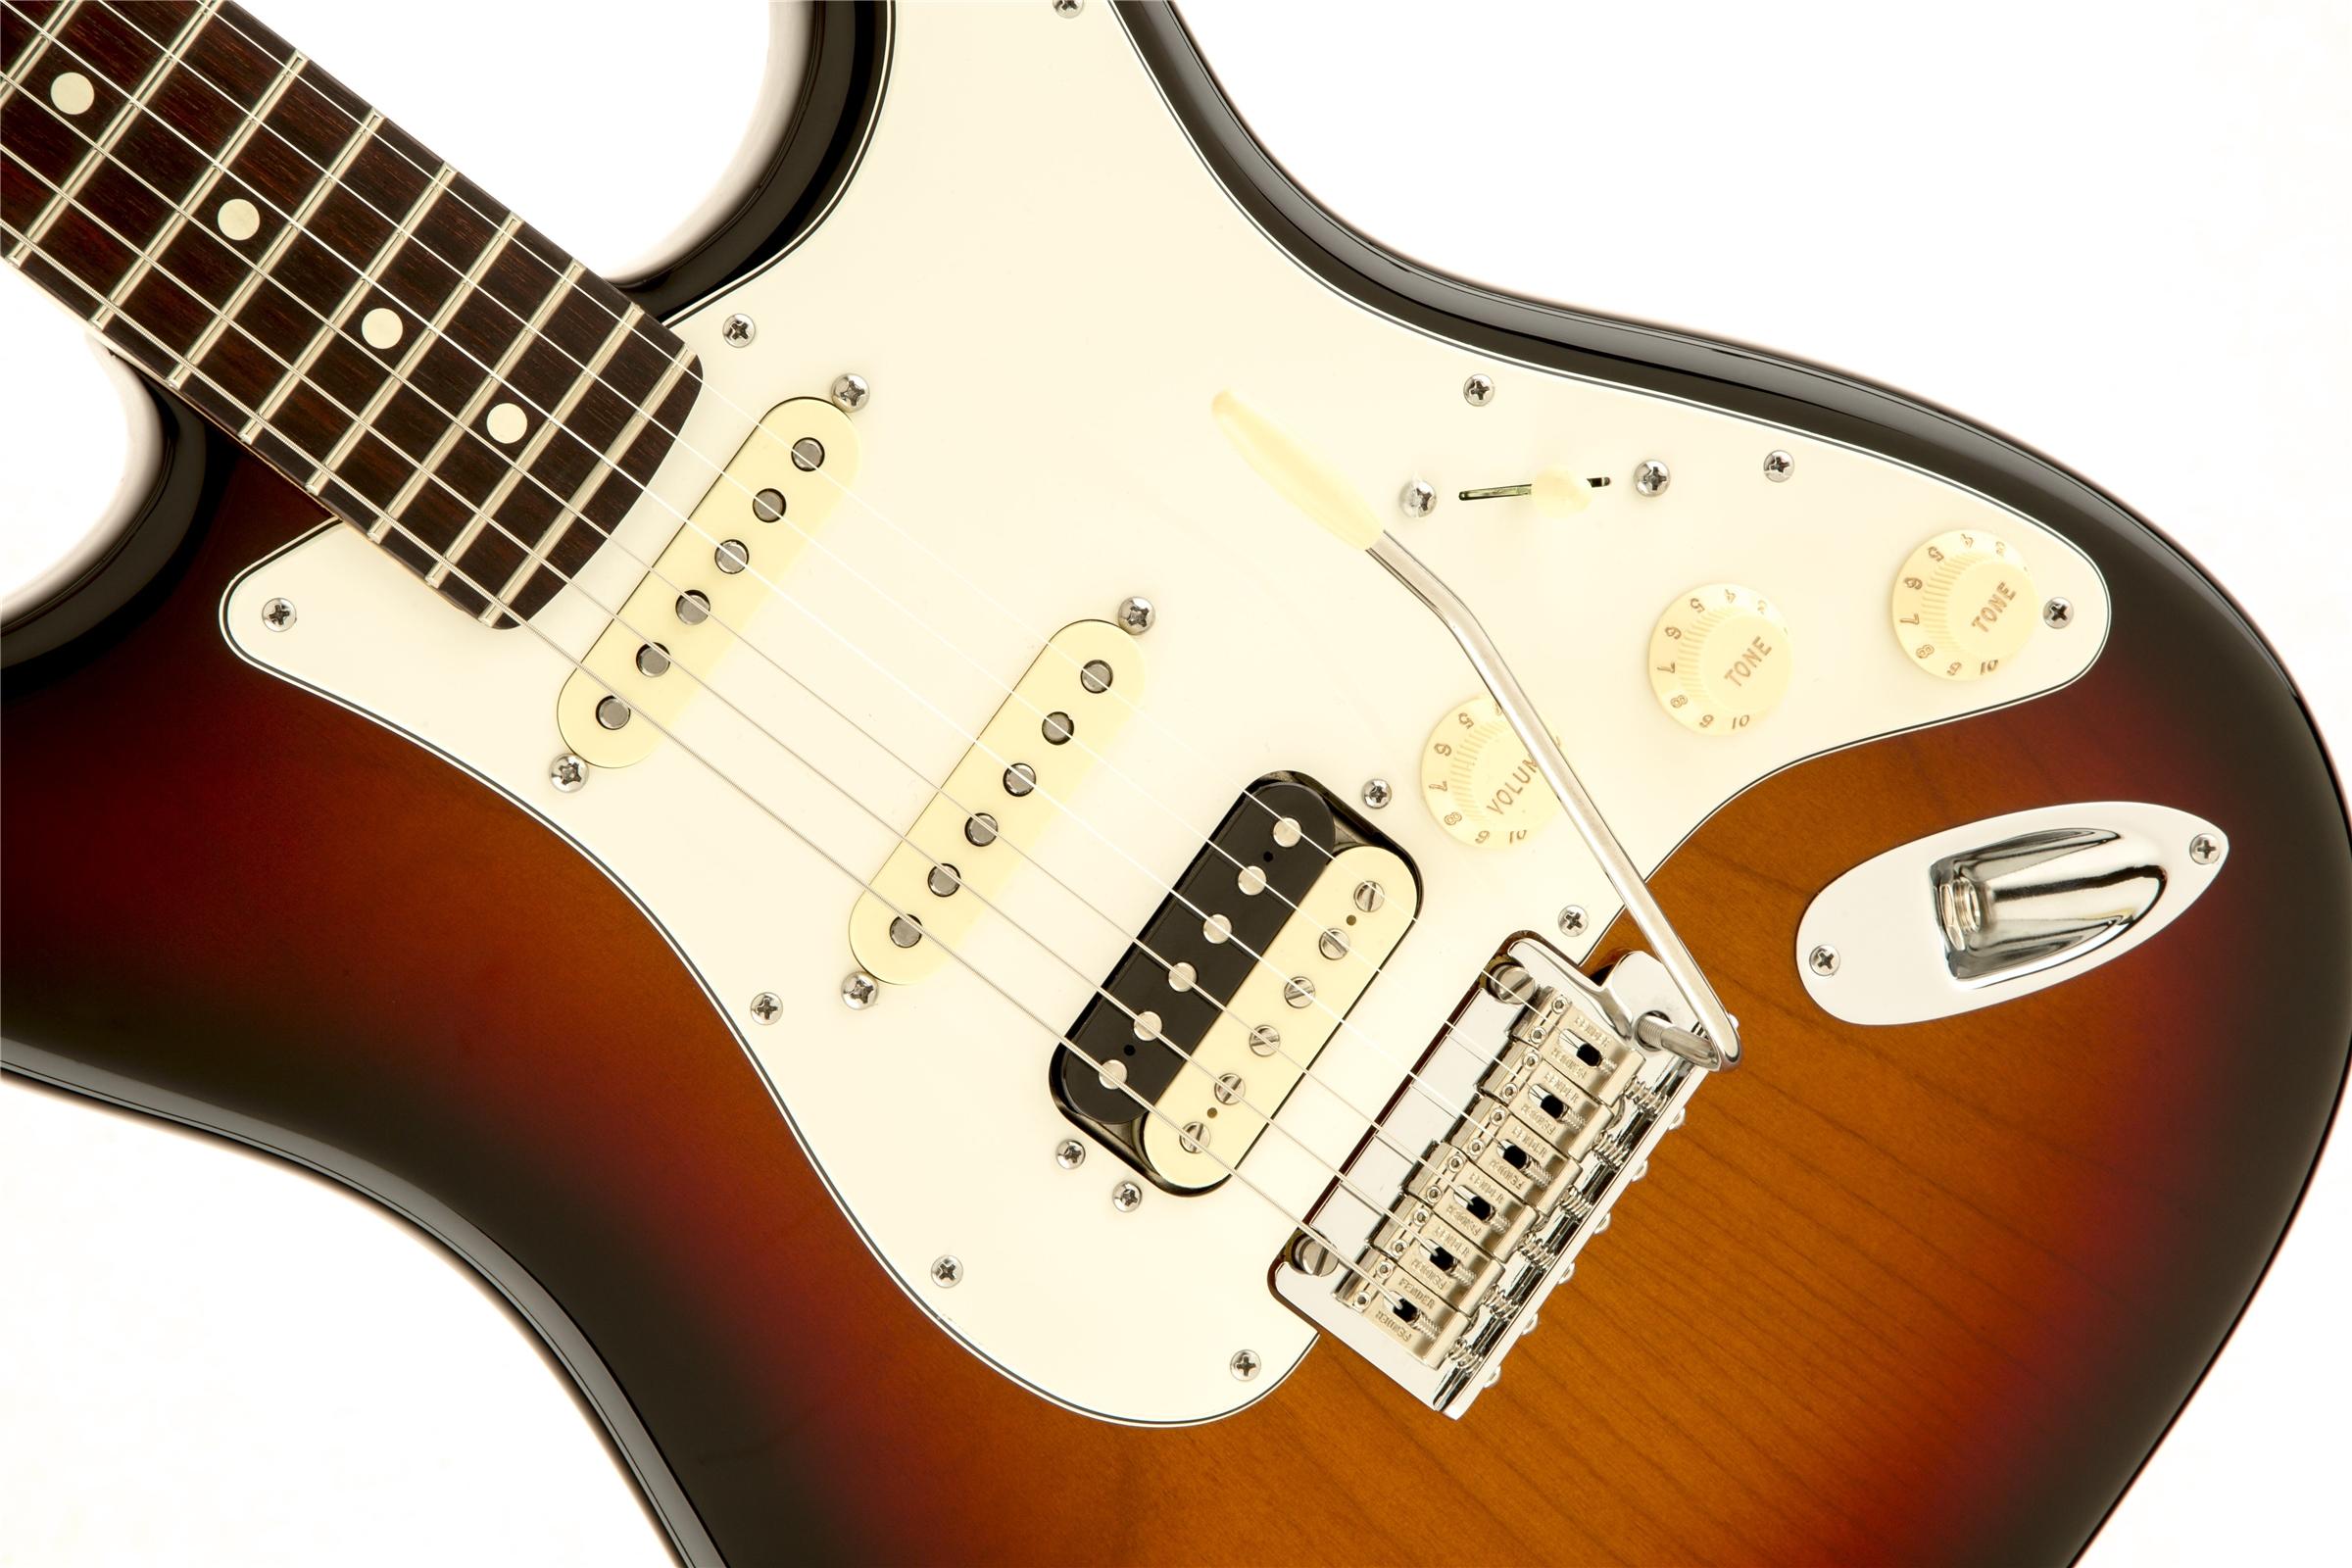 Fender American Standard Stratocaster Hss Shawbucker 3 Color Squier Sunburst Rosewood Fingerboard Electric Guitar